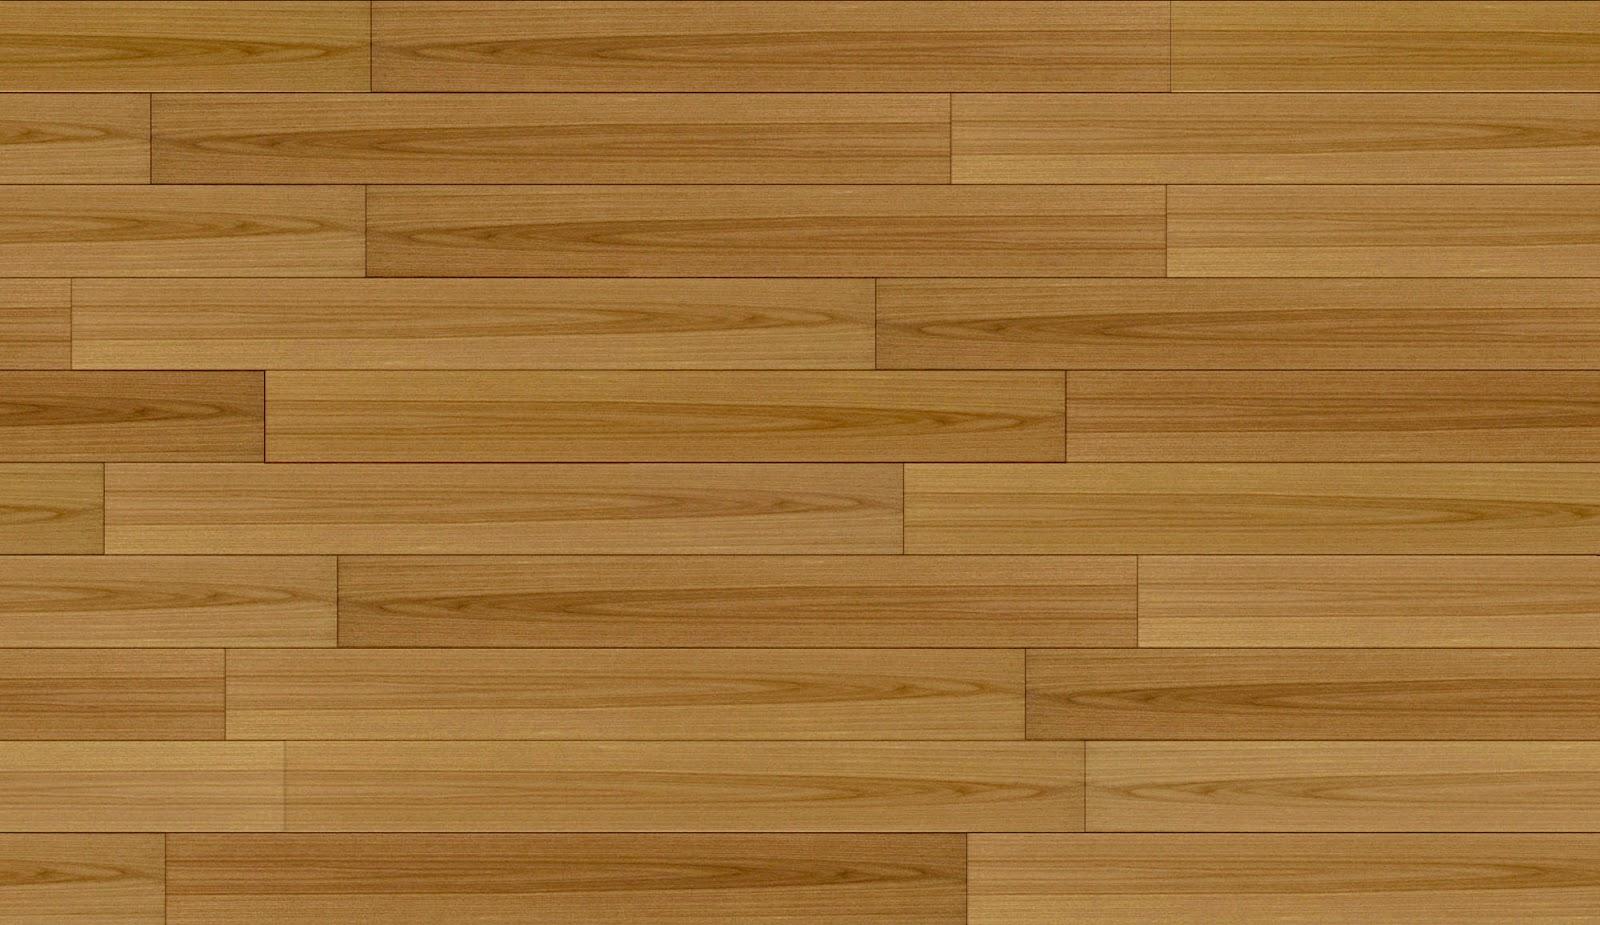 Sketchup texture texture wood wood floors parquet bambu for Parquet bambu